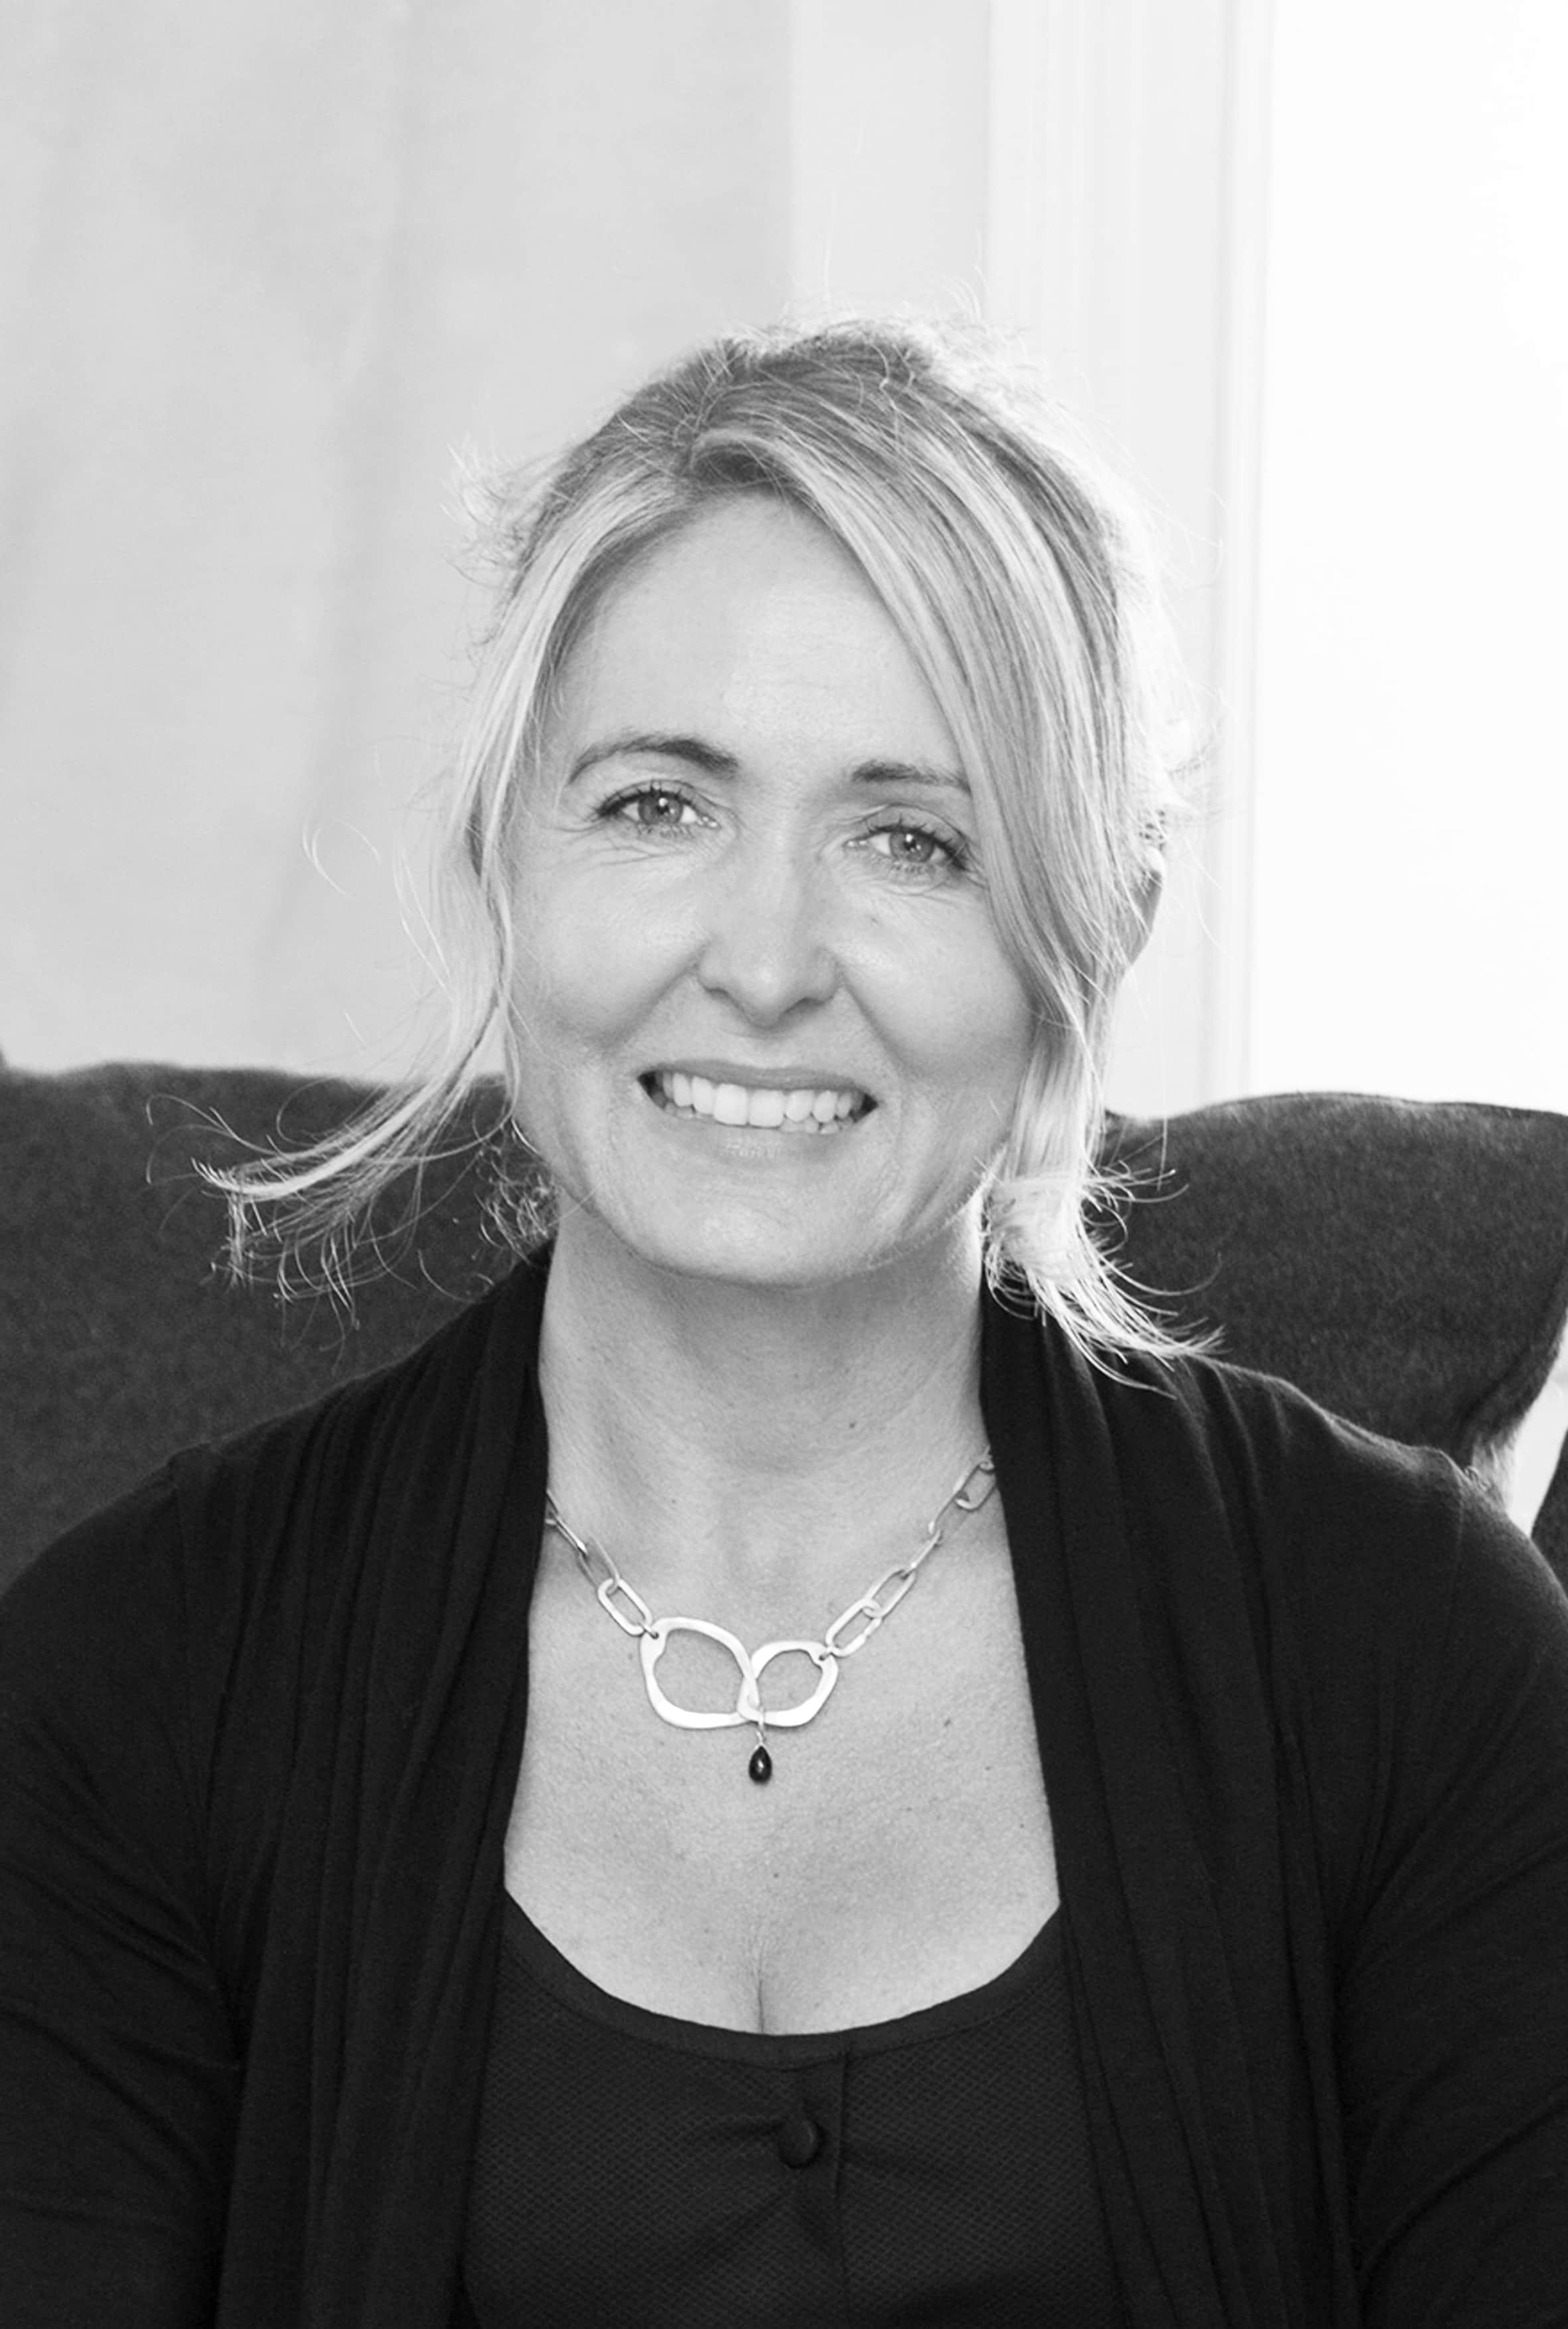 Marie-Louise Hellgren